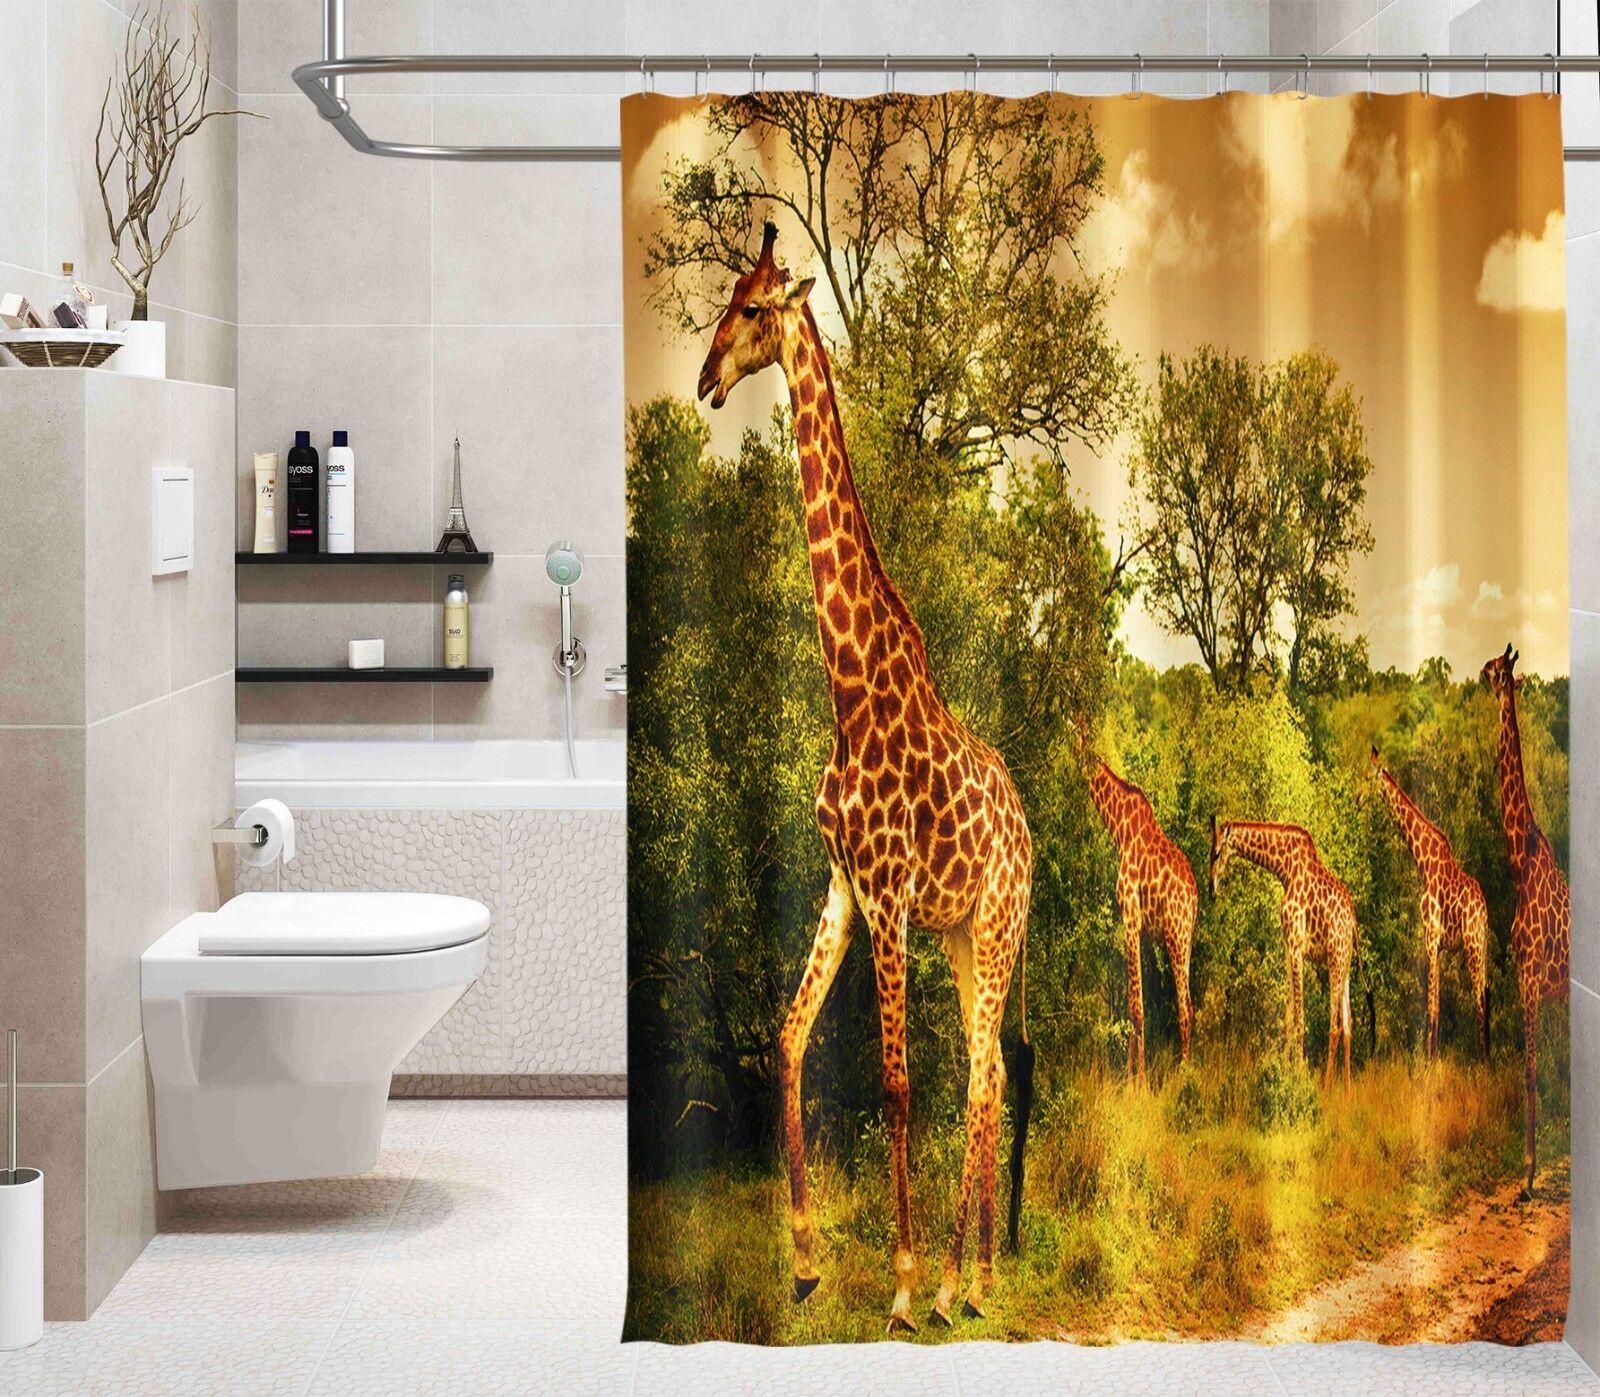 Home & Garden 3d Brüllen Löwe 7 Duschvorhang Wasserdicht Faser Bad Daheim Windows Toilette De